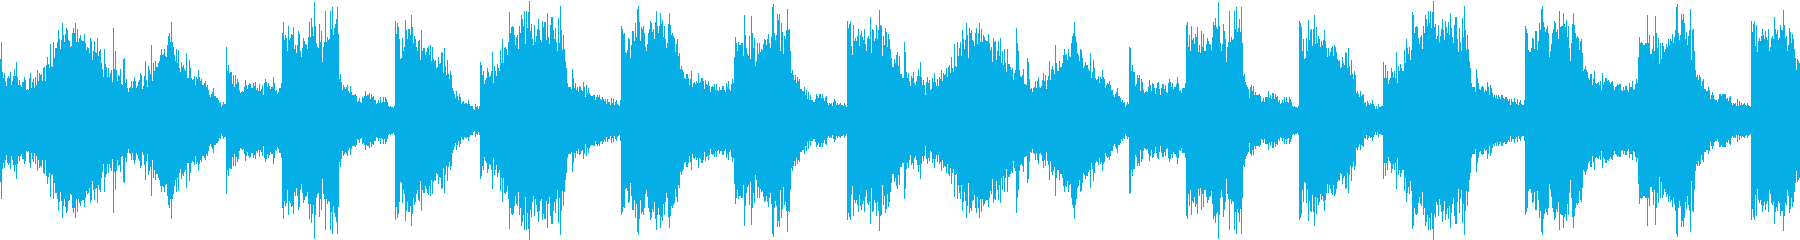 EDM リードシンセ 3 音楽制作用の再生済みの波形